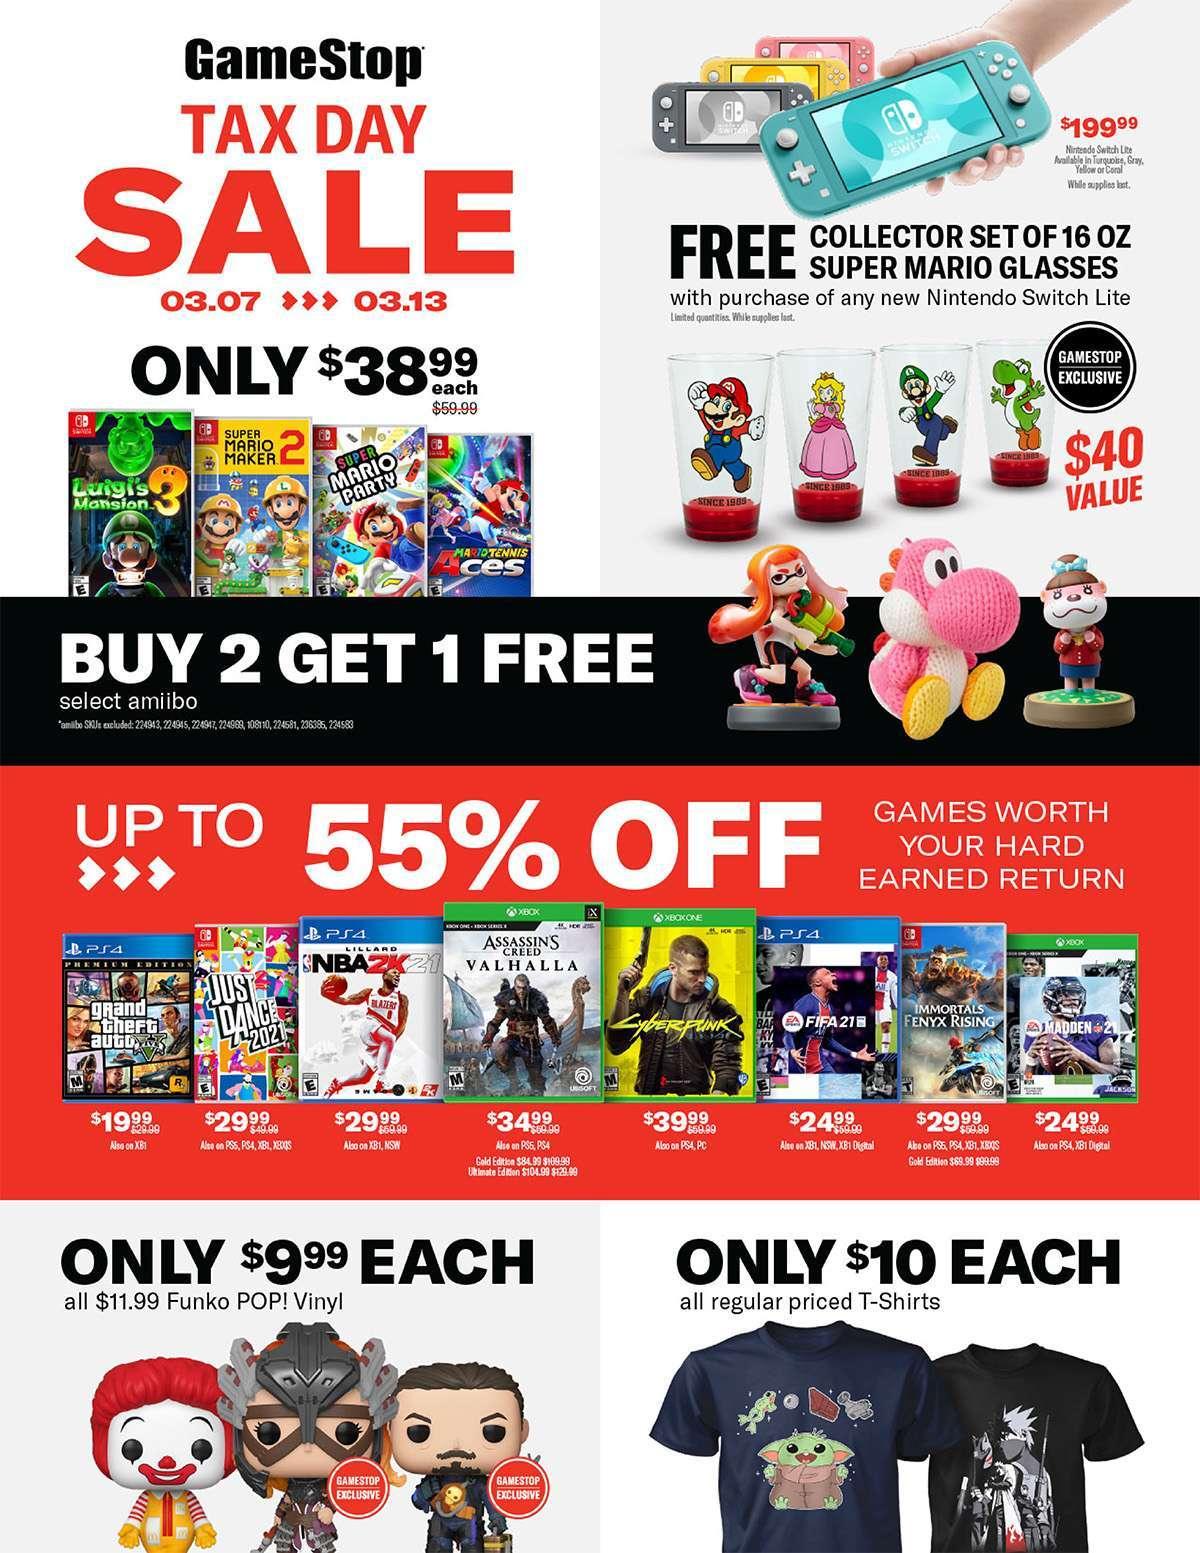 gamestop-tax-day-sale-1